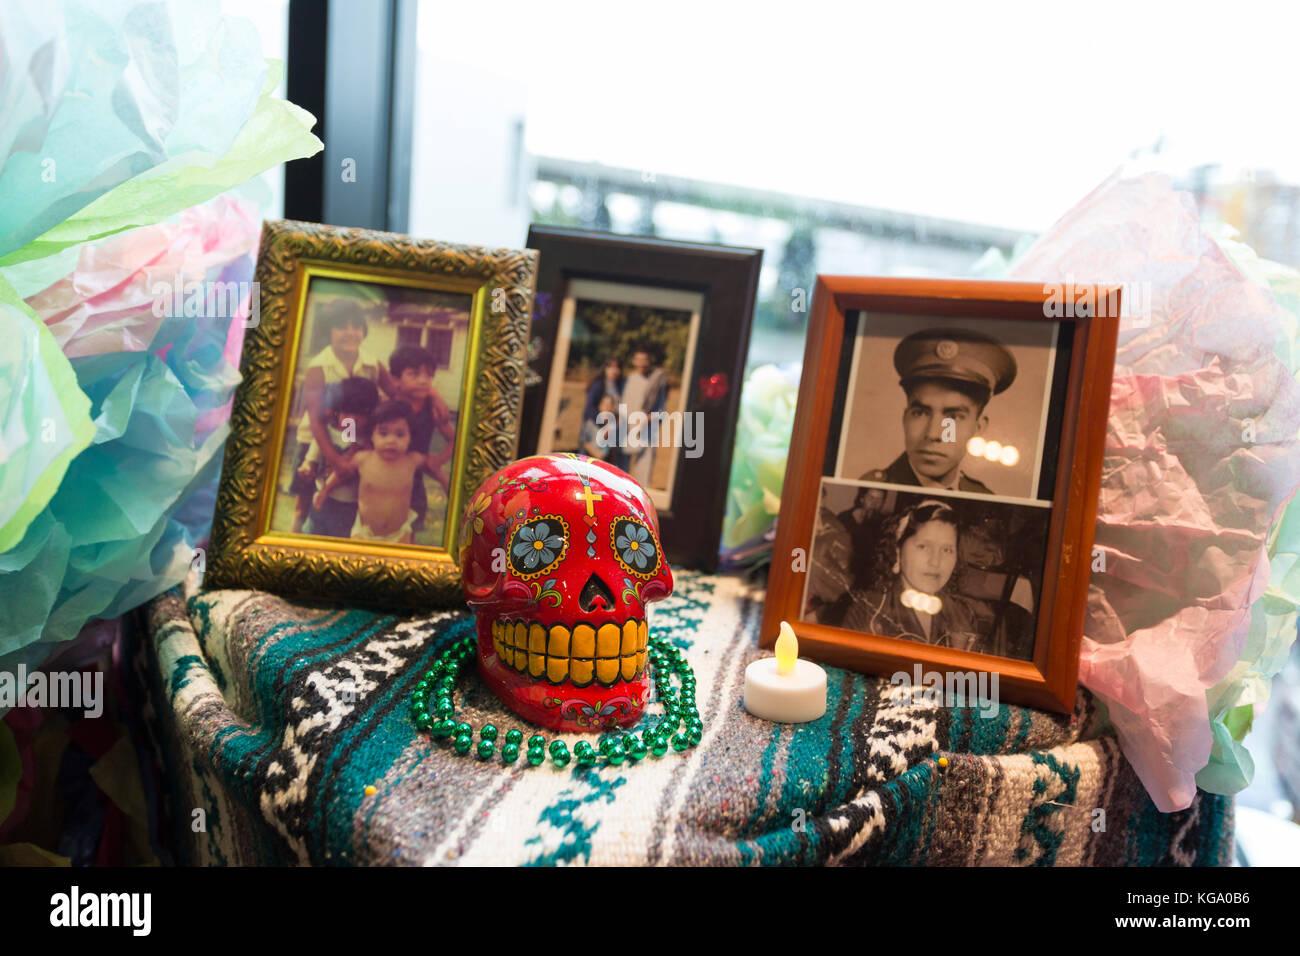 Tacoma, United States. 05th Nov, 2017. Tacoma, Washington: Offerings on display at Día de los Muertos Community - Stock Image